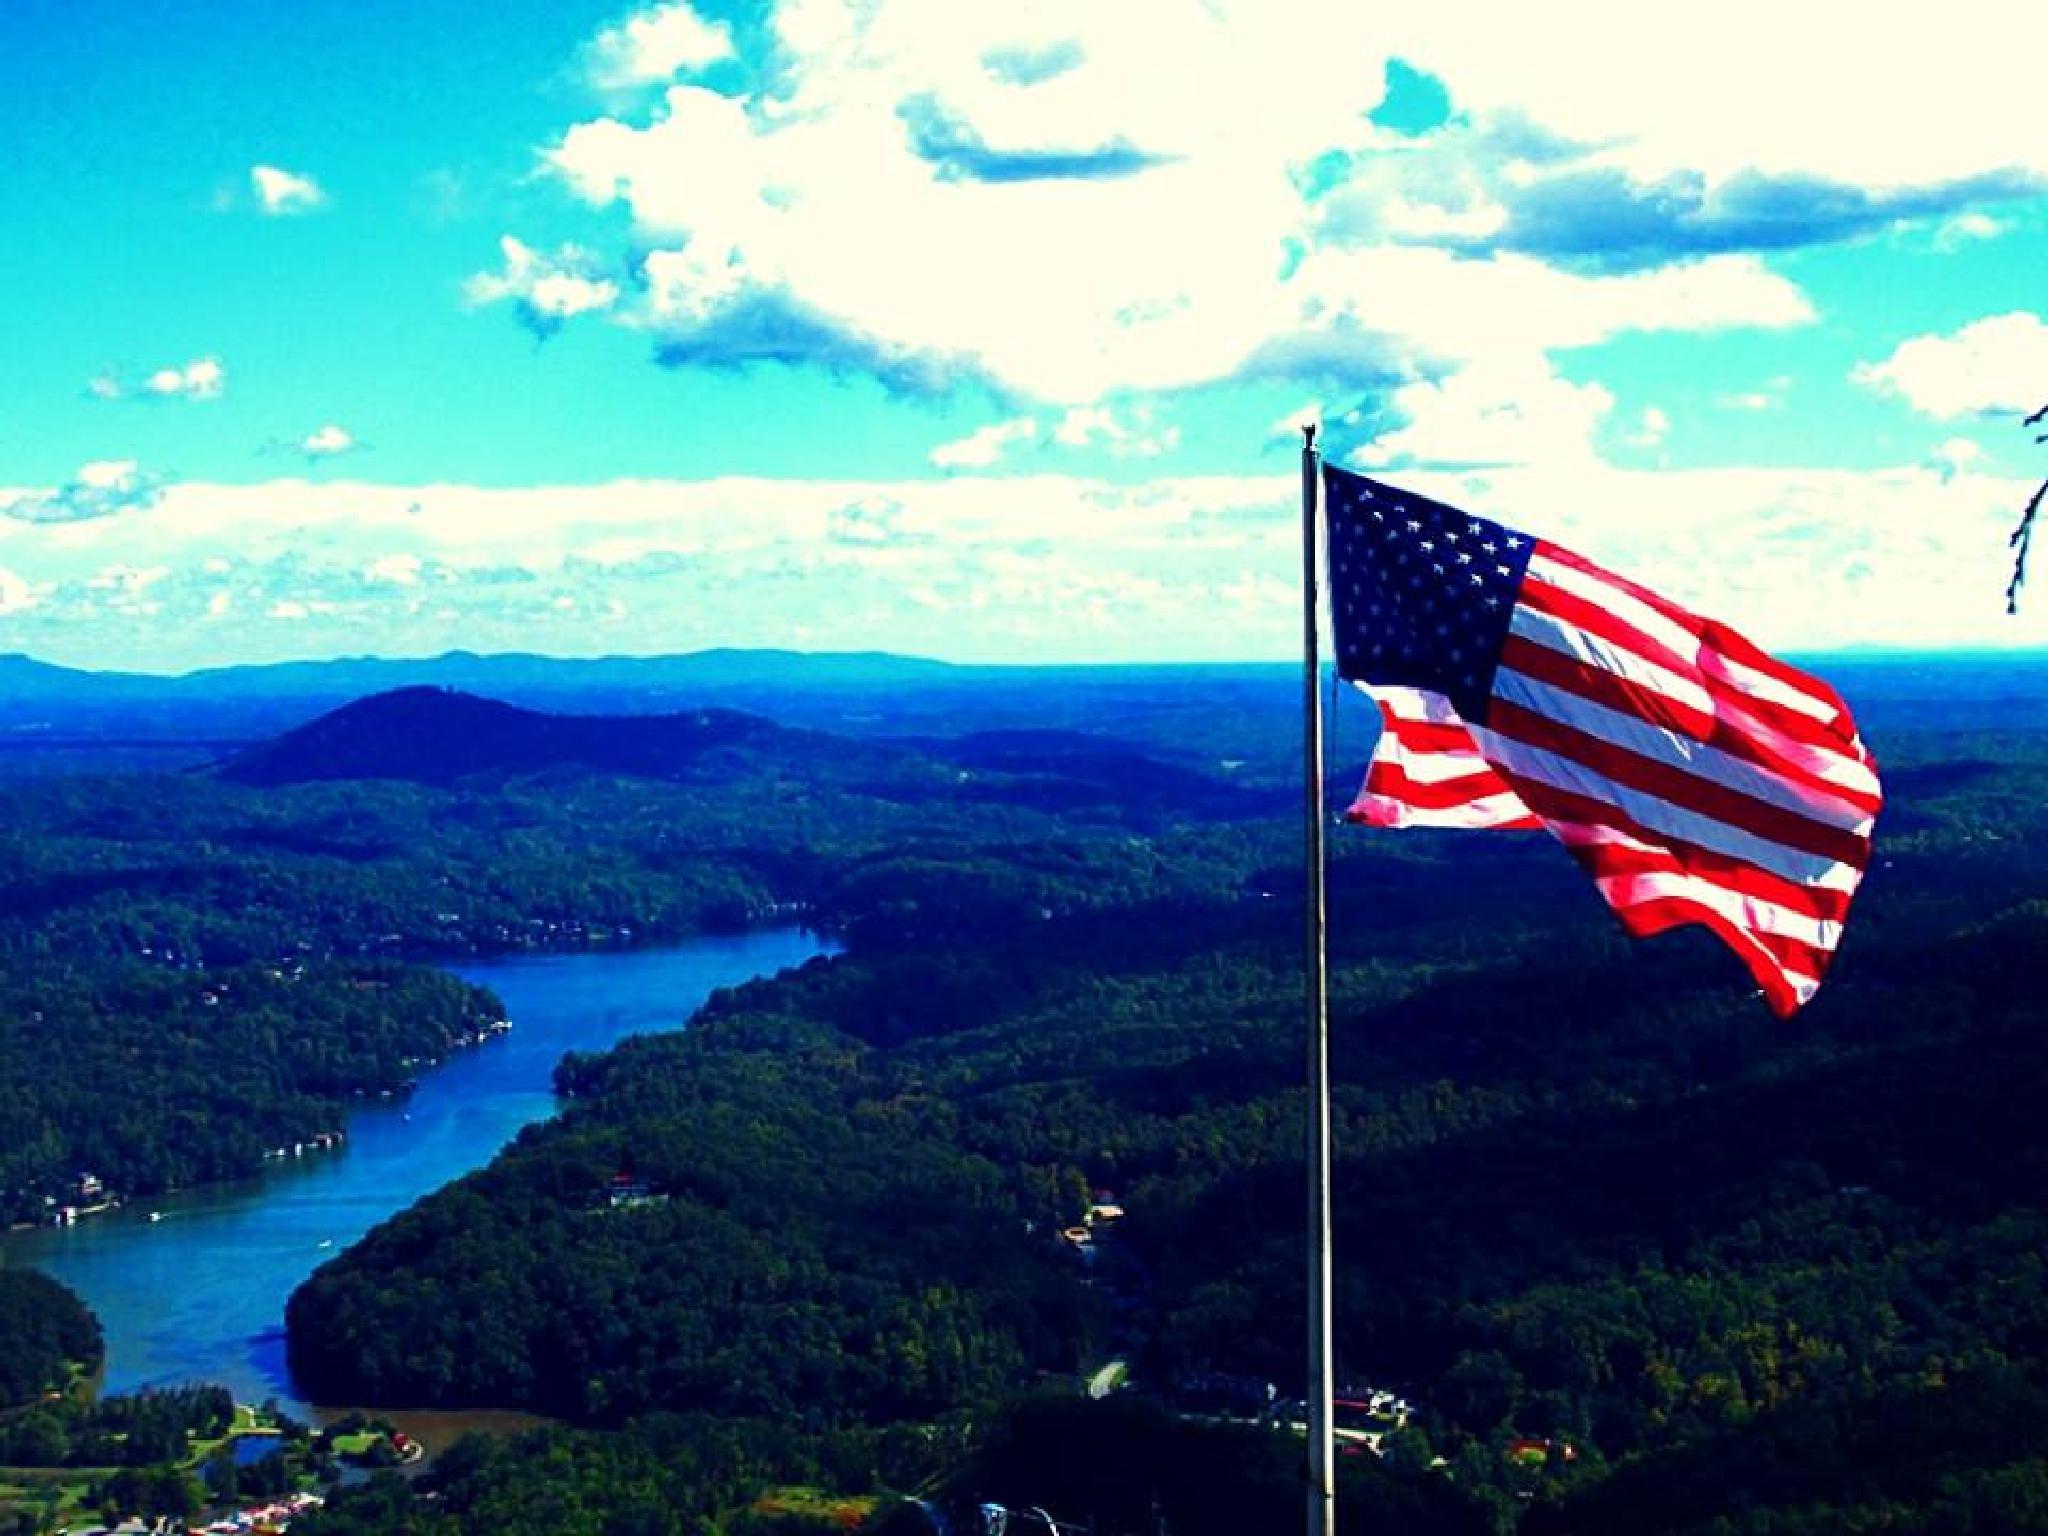 The flag, flying. by Chelsey Elizabeth